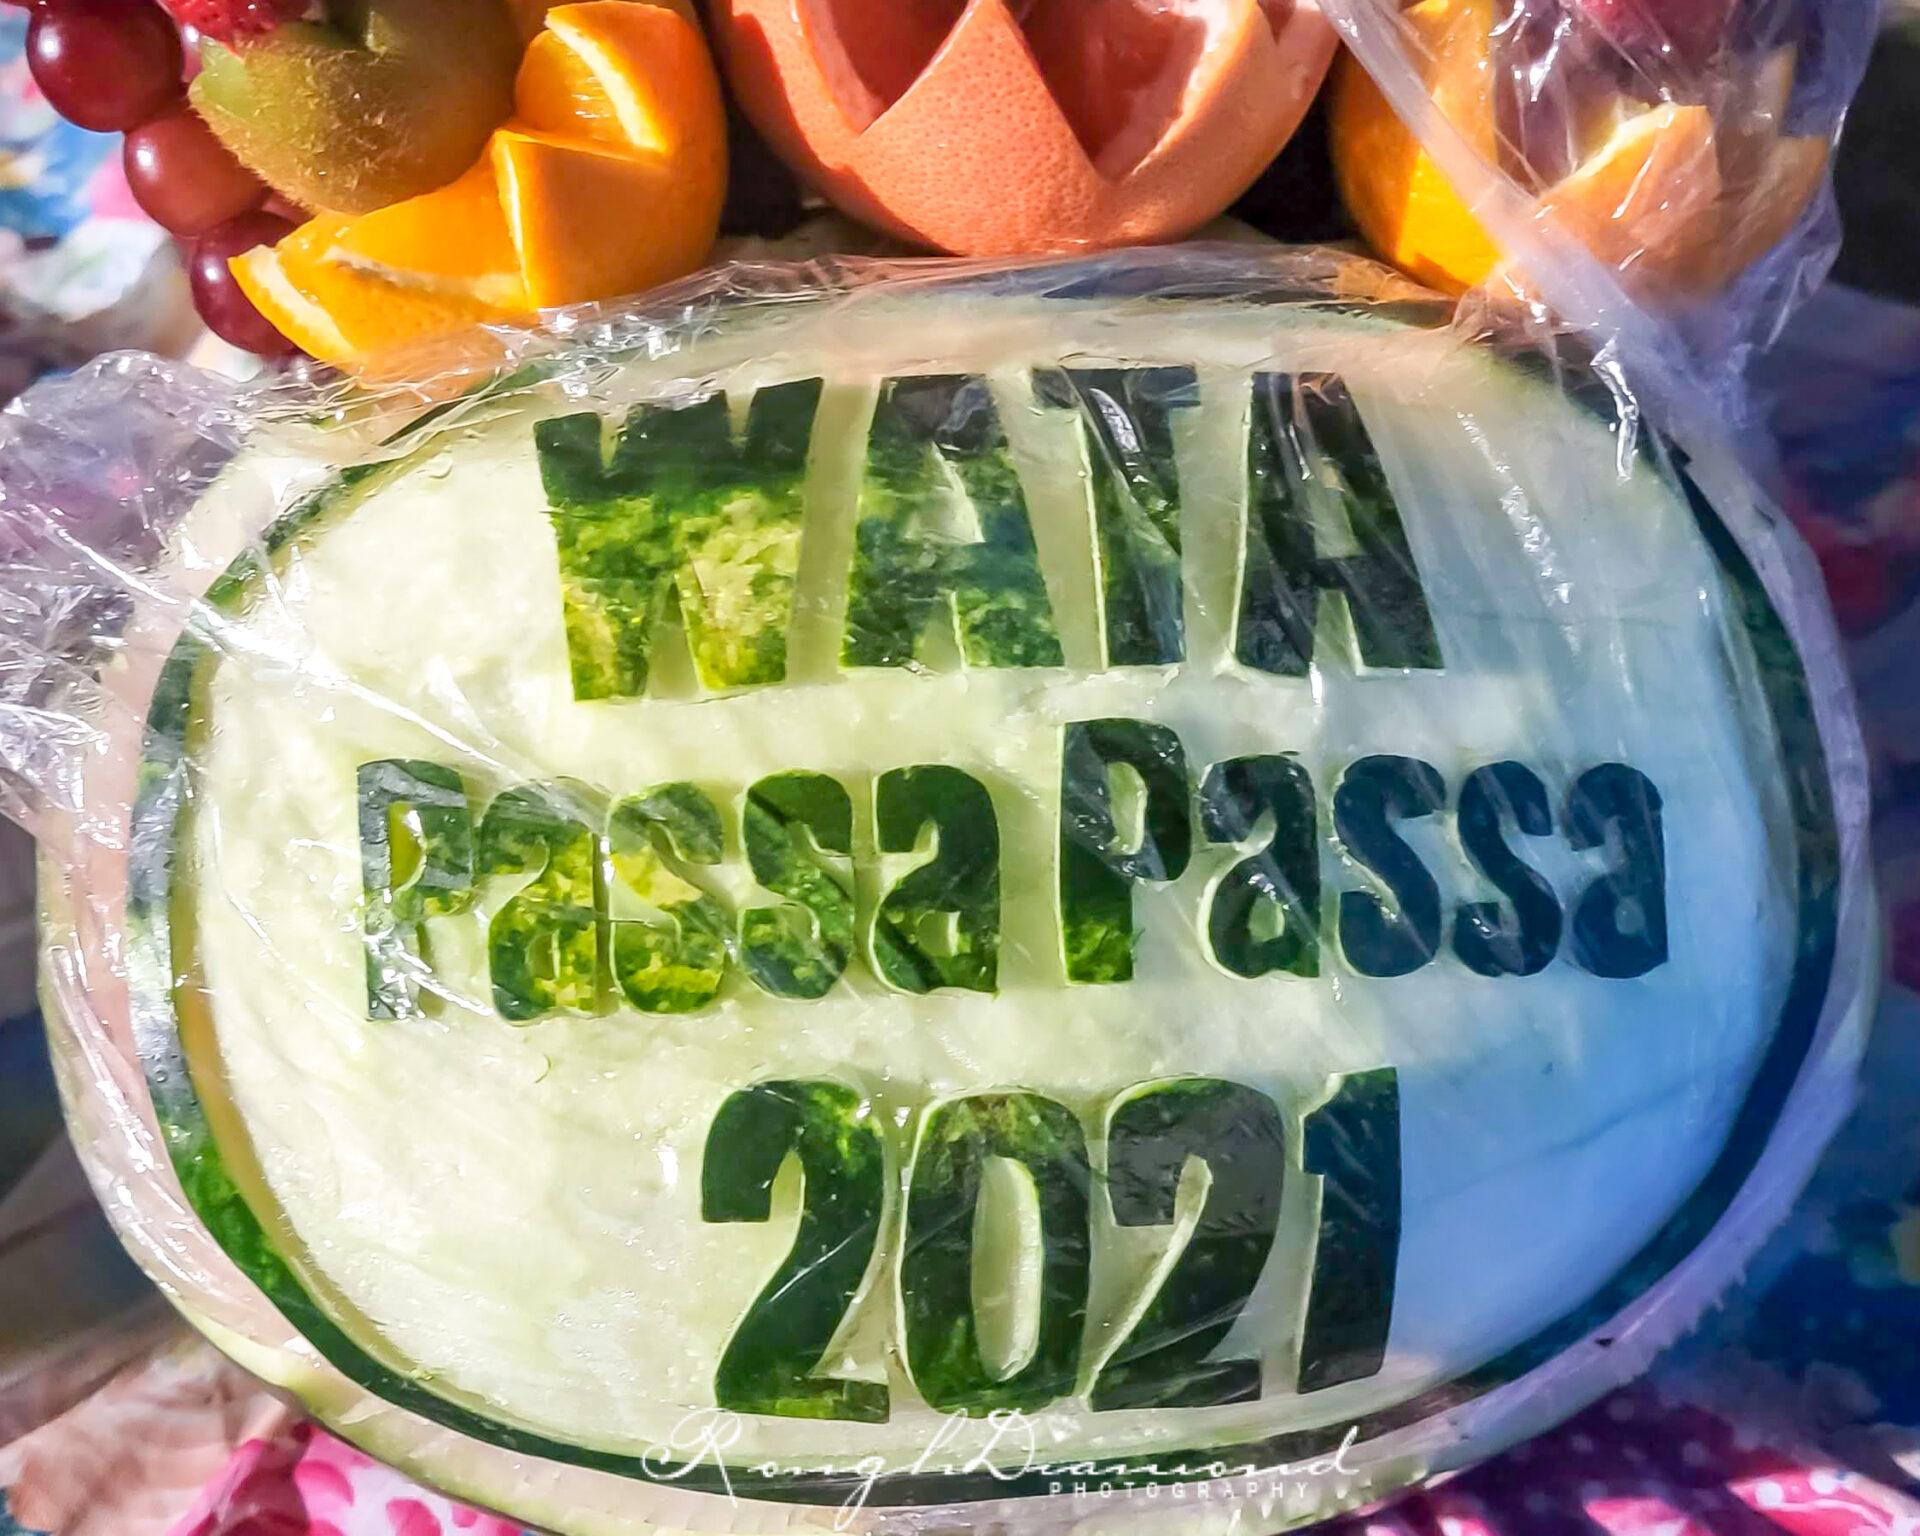 Wata Passa Passa Water Foam Party 2021